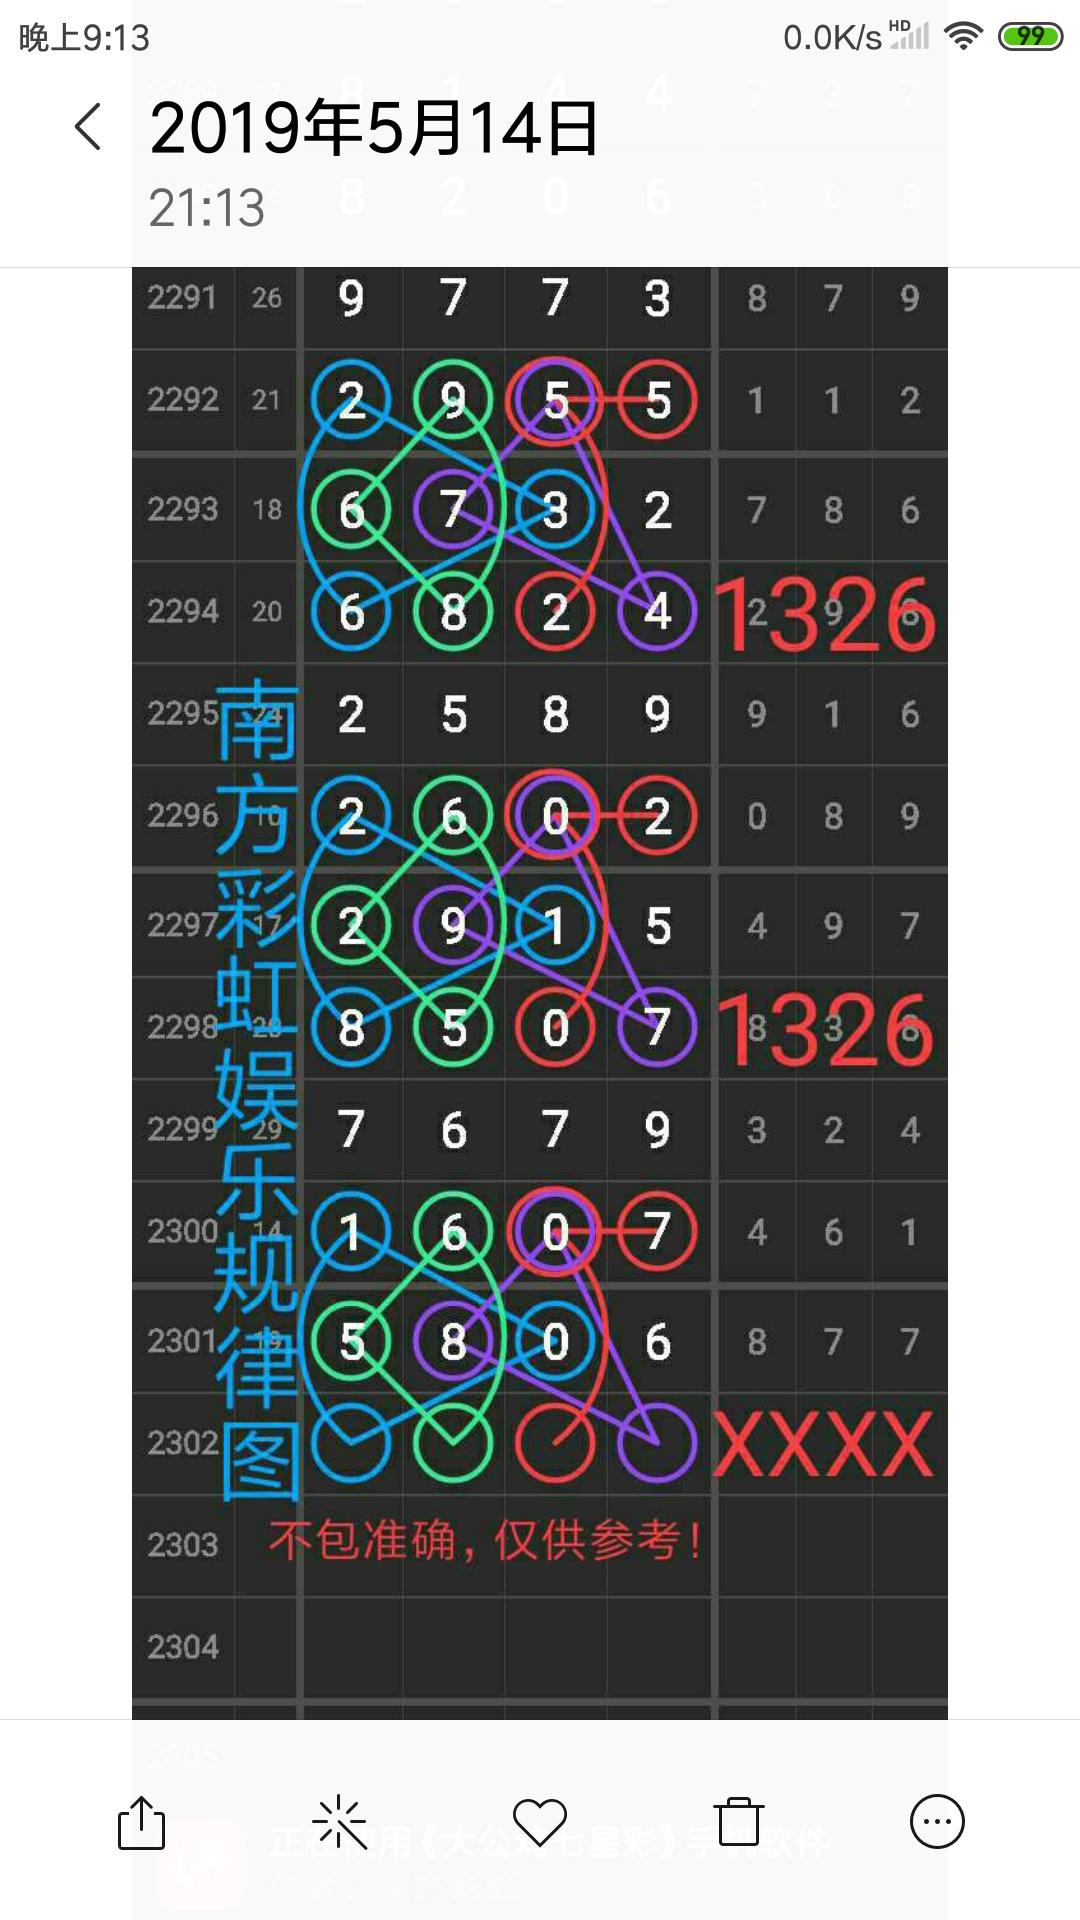 Screenshot_2019-05-14-21-13-07-965_com.miui.gallery.png